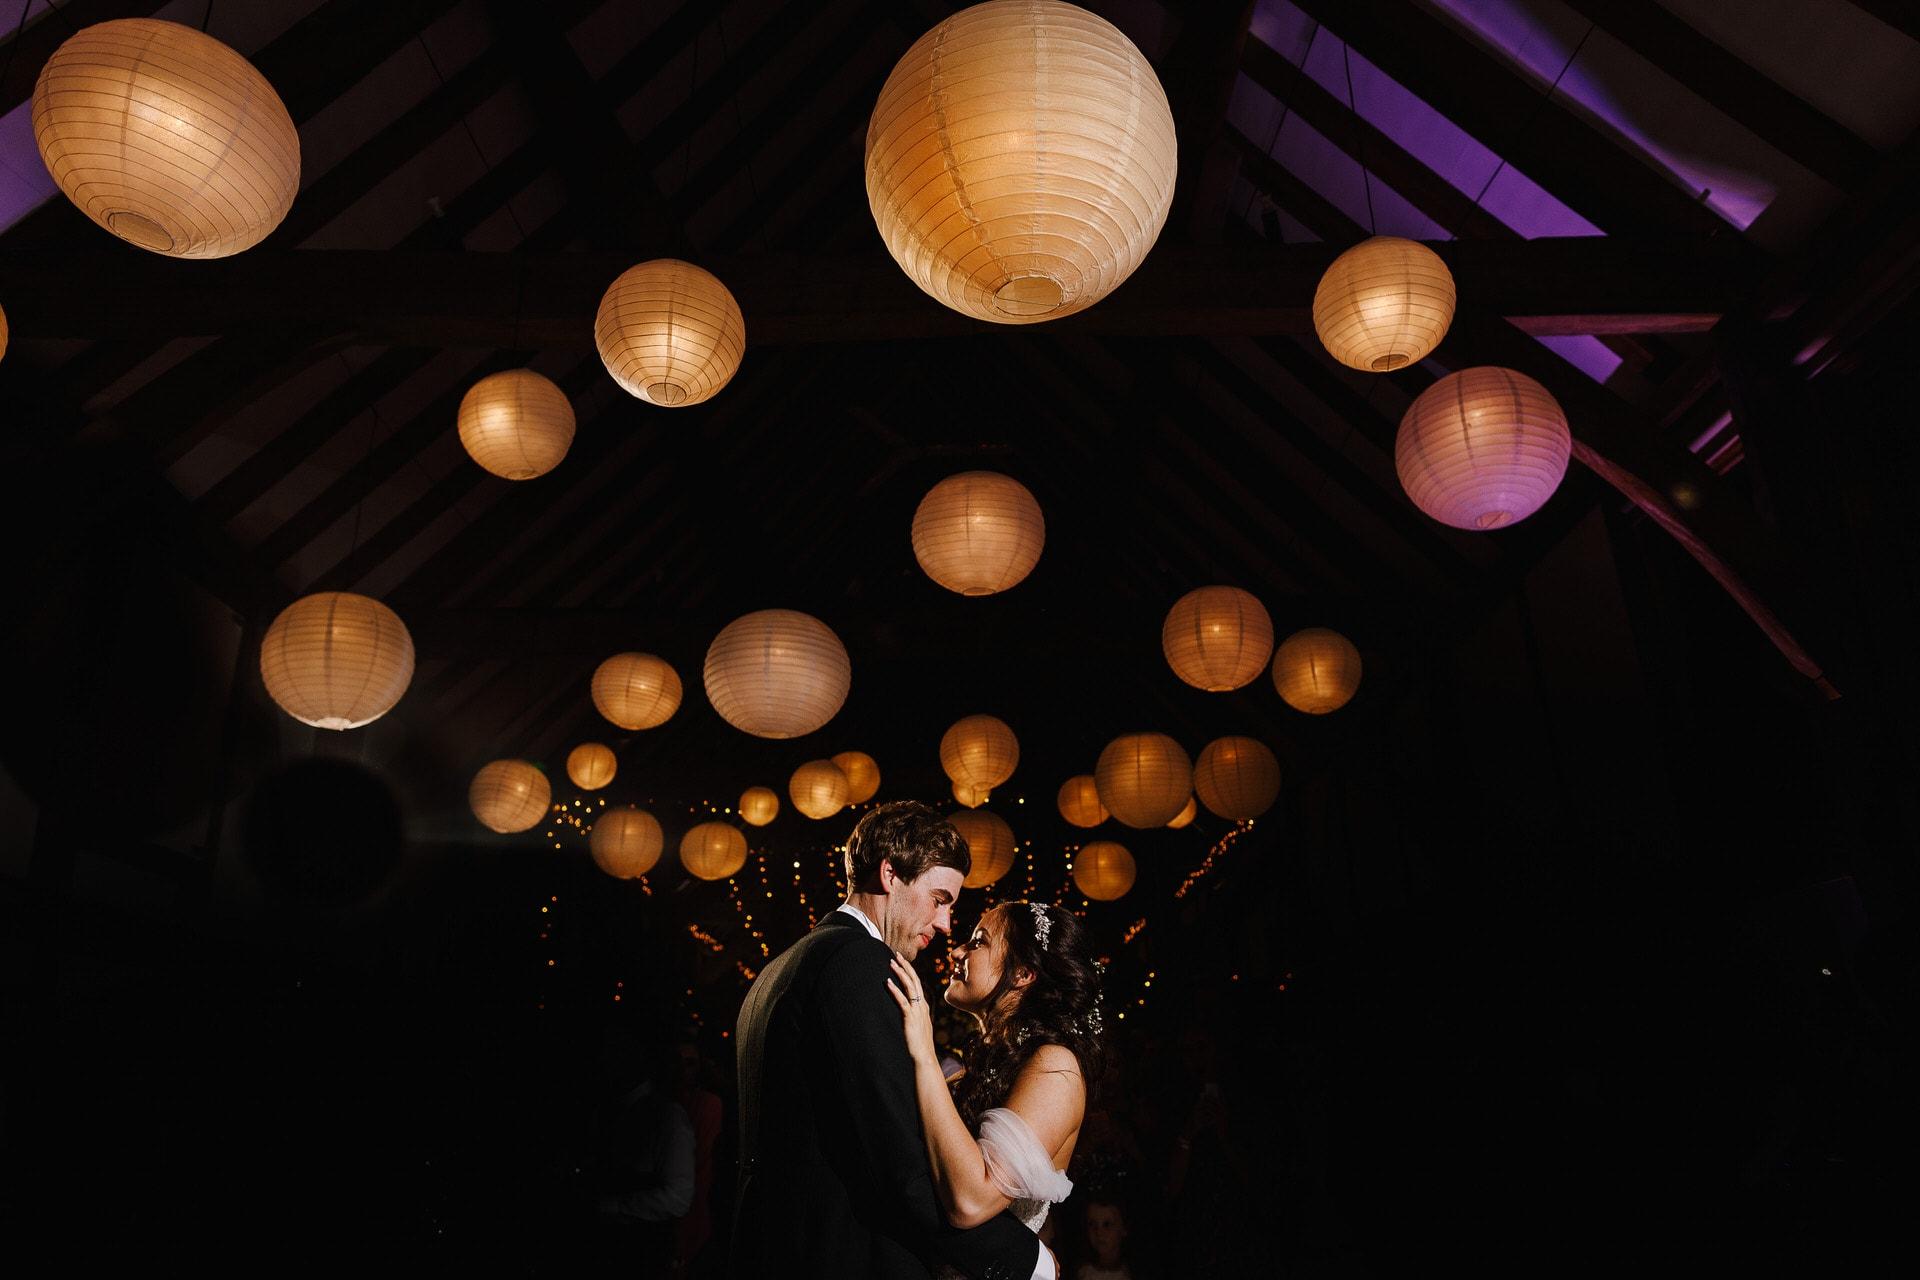 Colour-changing lanterns at Loseley Park wedding